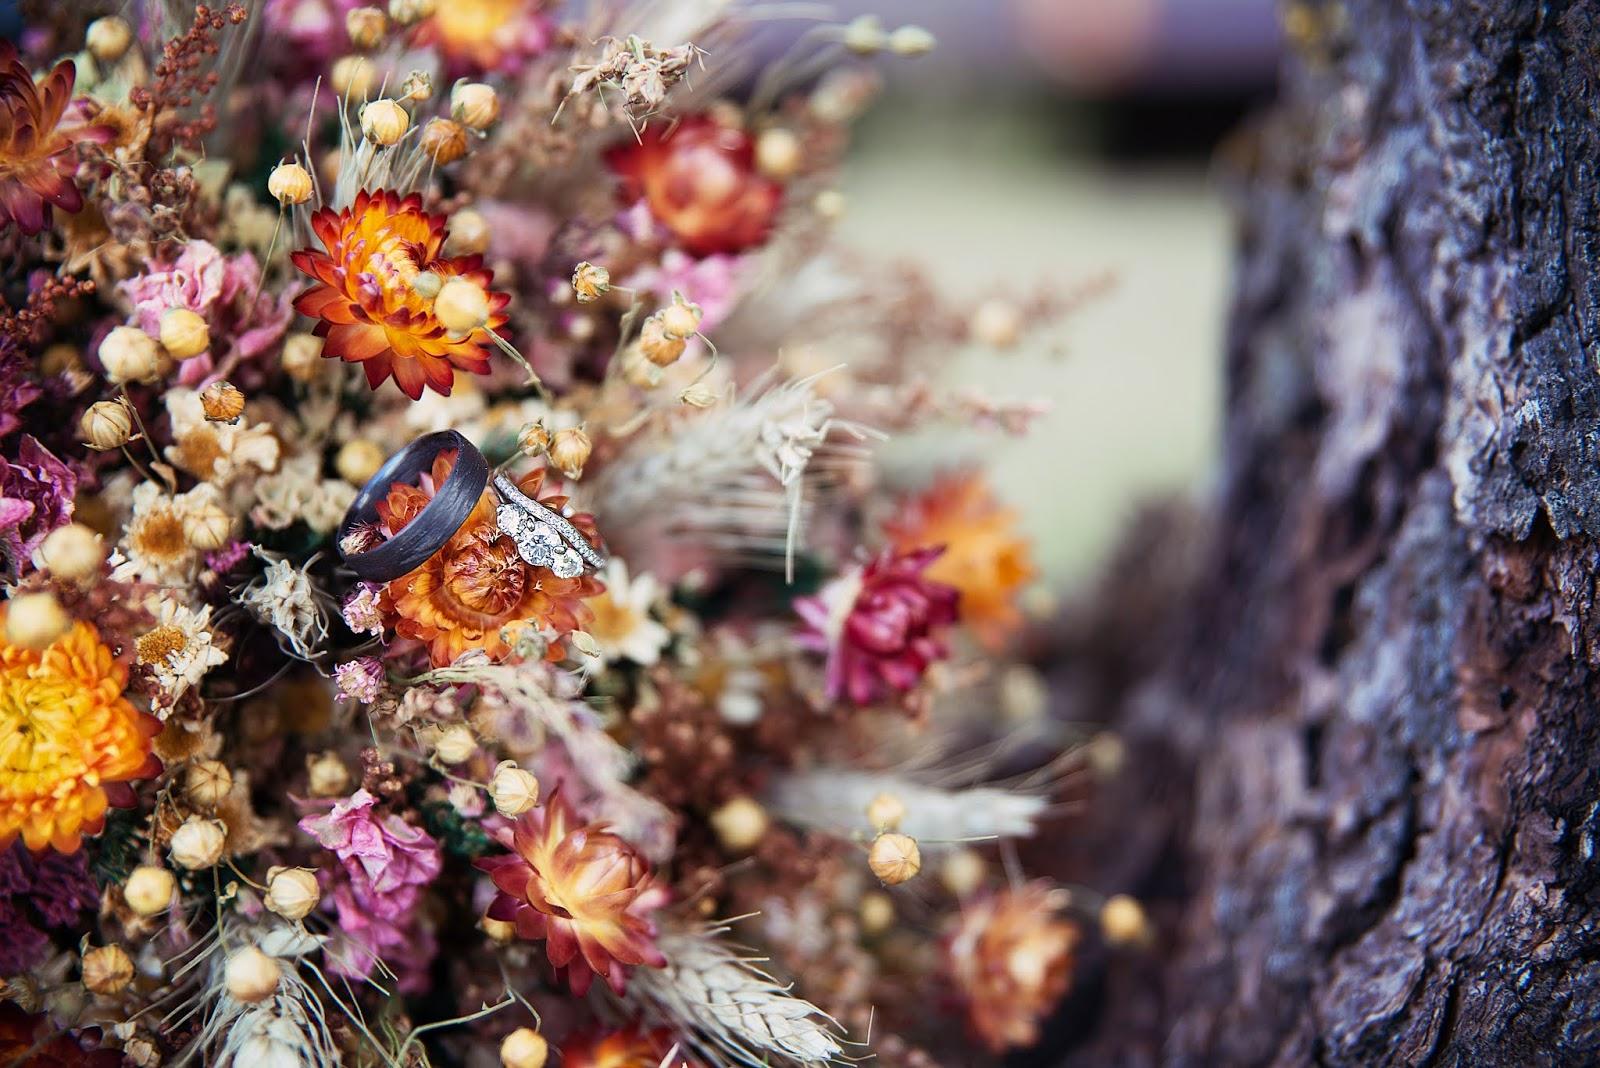 .Sarah & Marshall Wedding.Coeur d'Alene, ID Wedding Photographer-Julie Dawn Photography